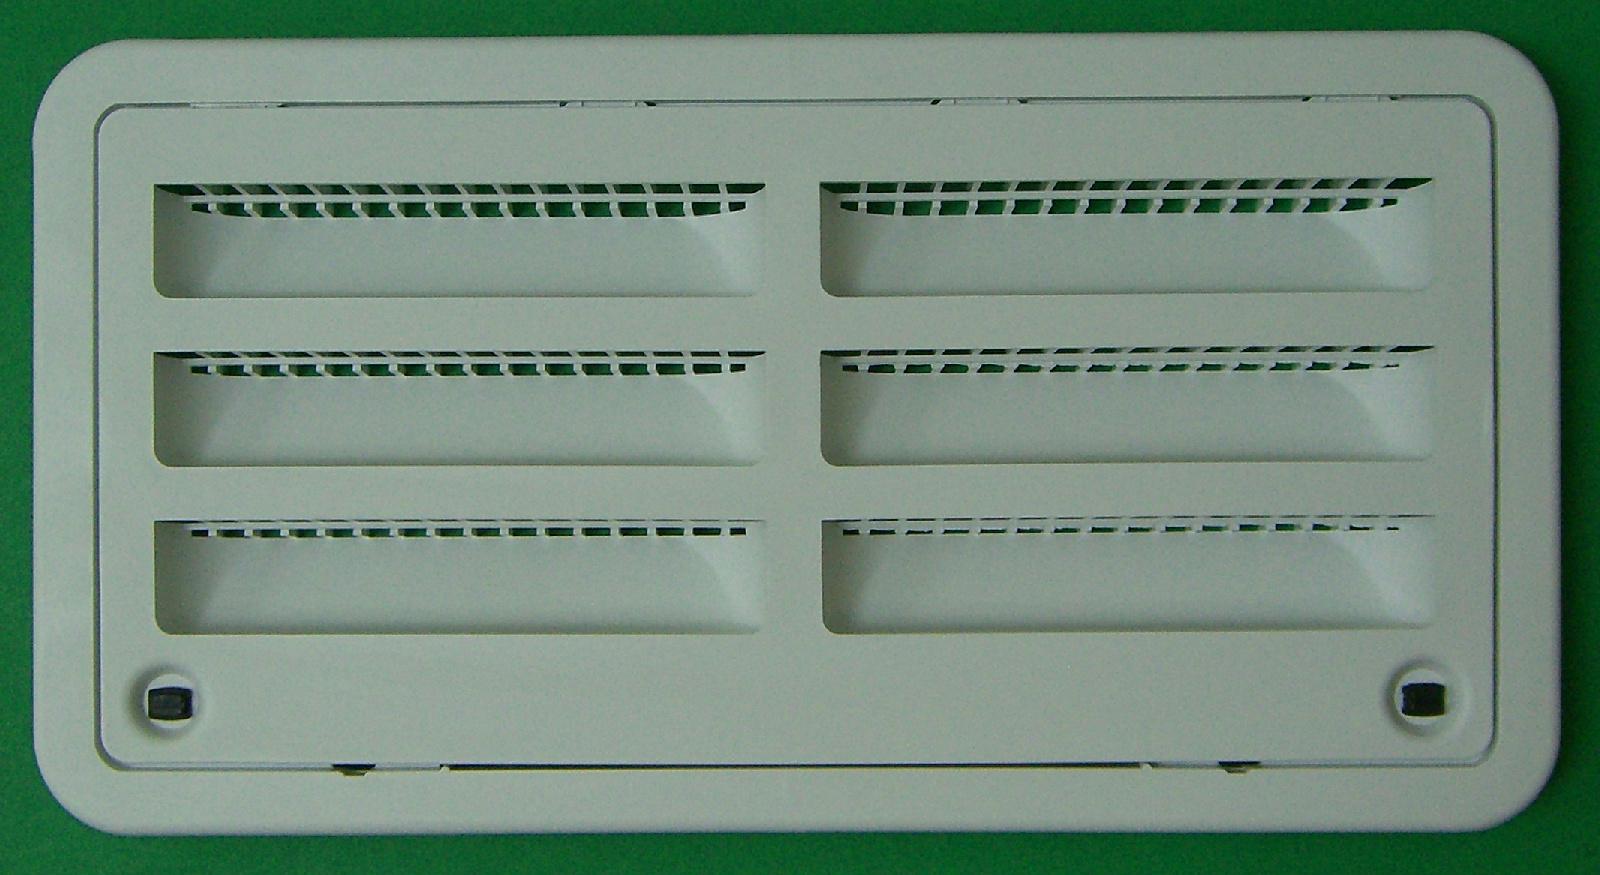 Dometic 3109492003 Rv Refrigerator Side Access Door Vent White